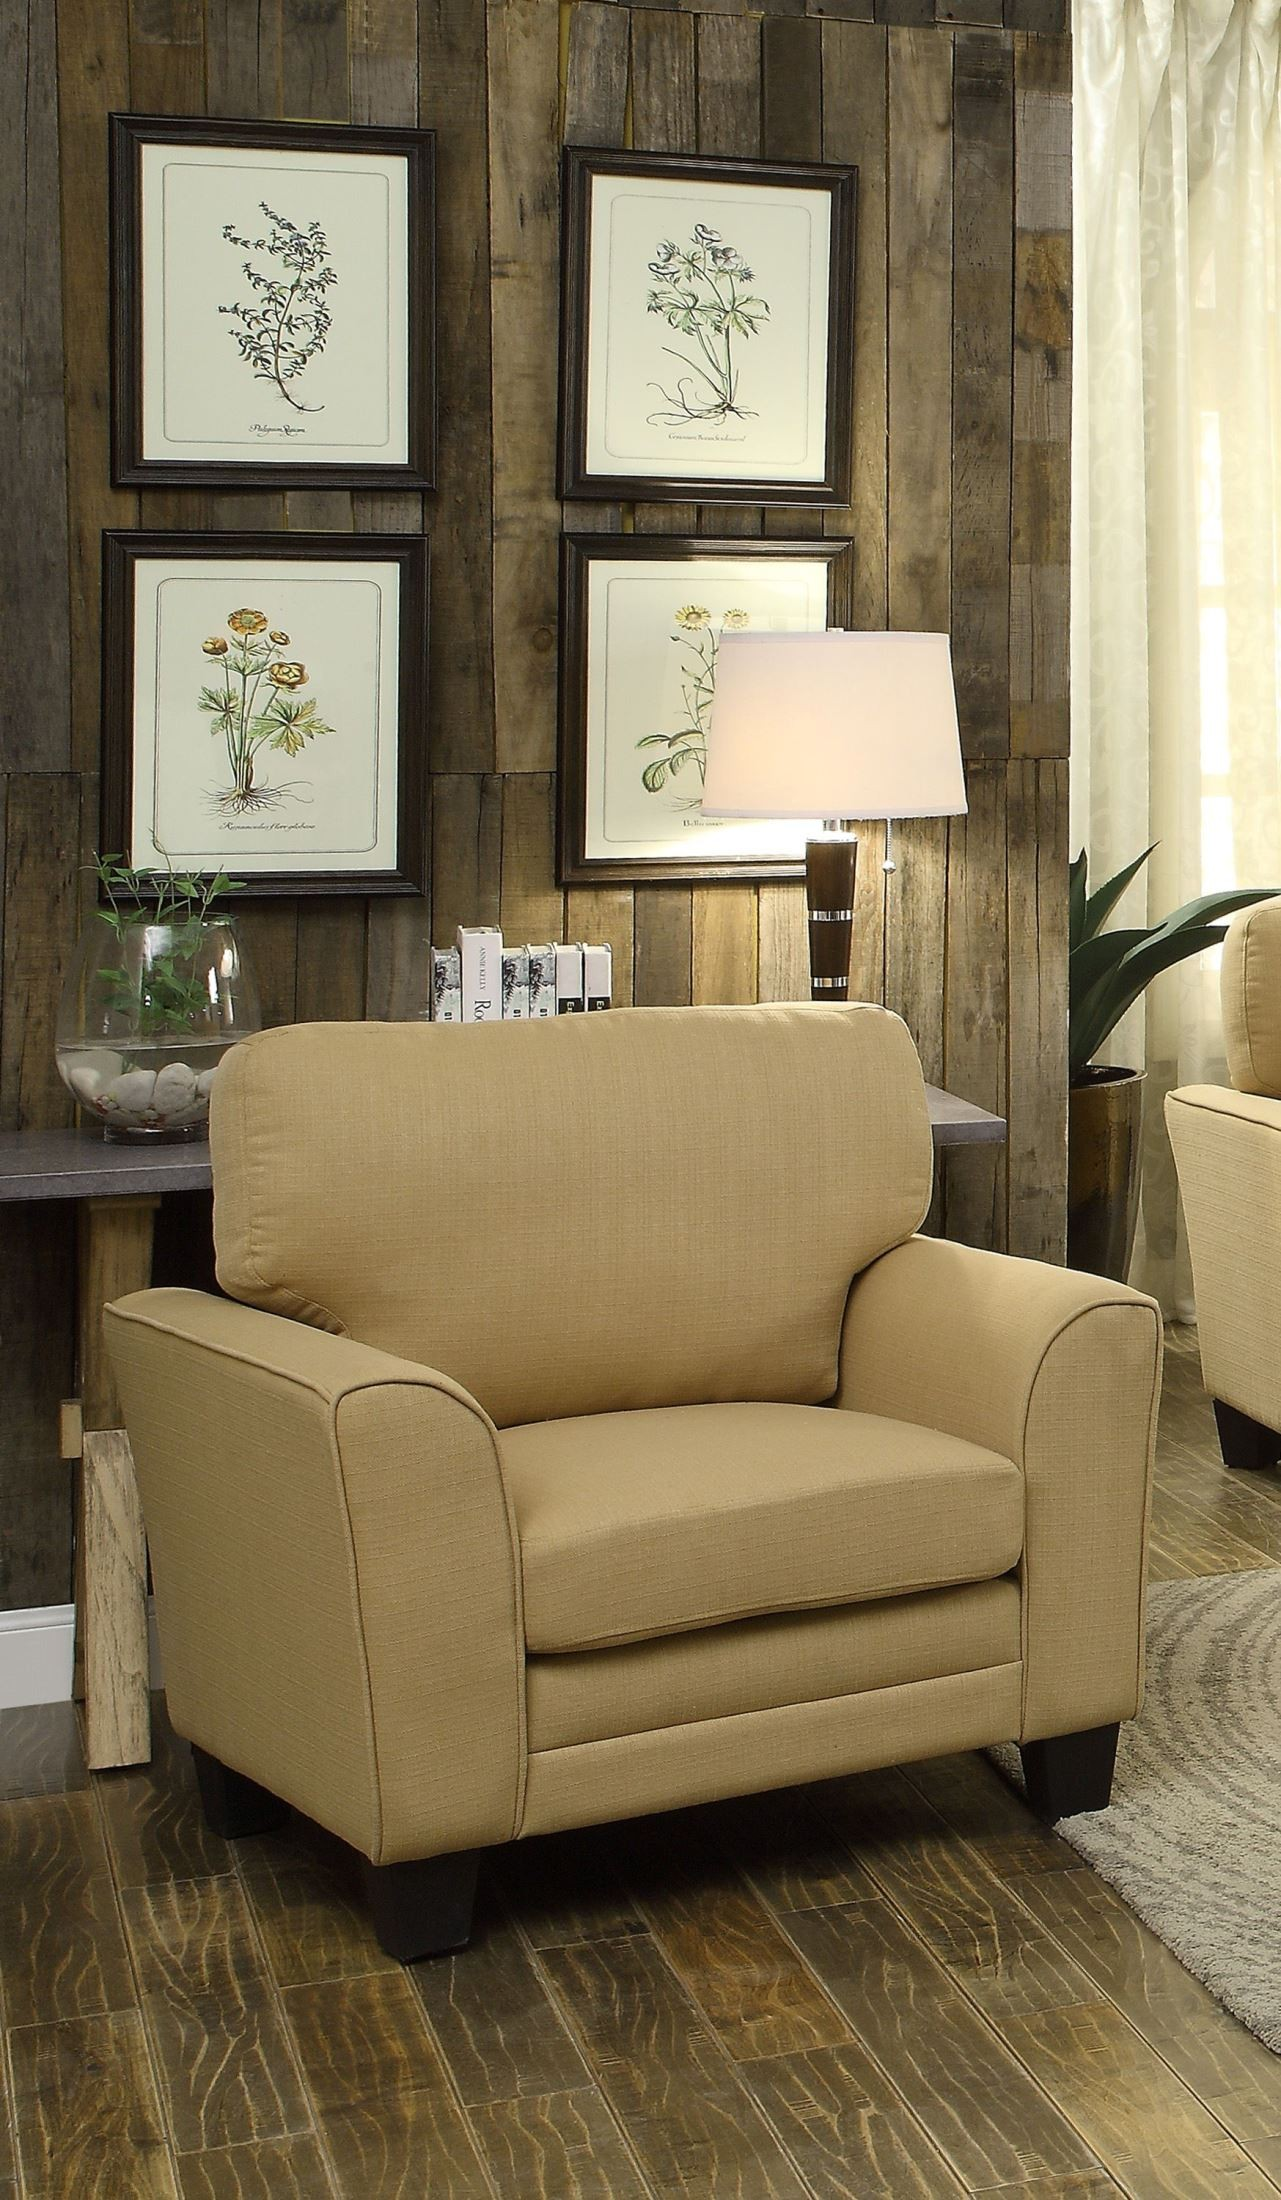 adair yellow living room set from homelegance 8413yw 3 coleman furniture. Black Bedroom Furniture Sets. Home Design Ideas